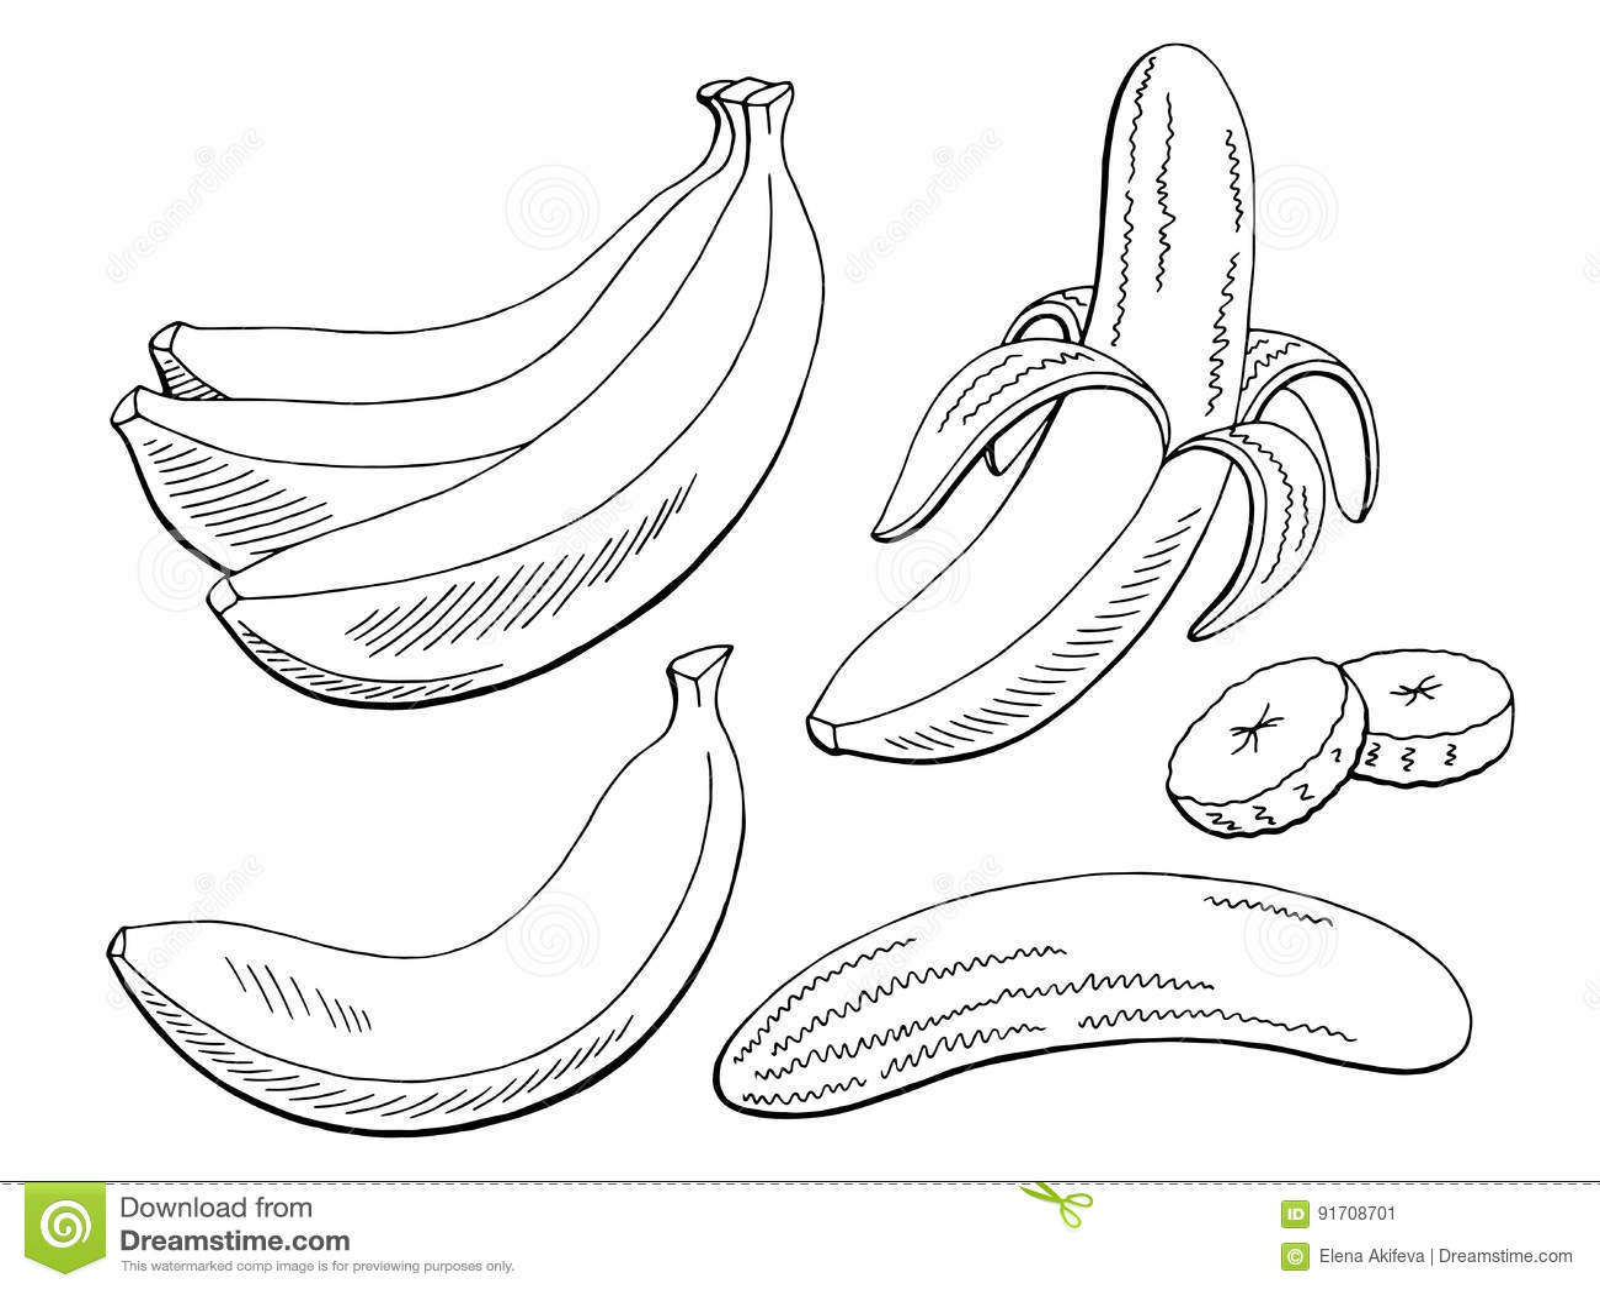 Banana Fruit Graphic Black White Isolated Sketch Illustration Stock